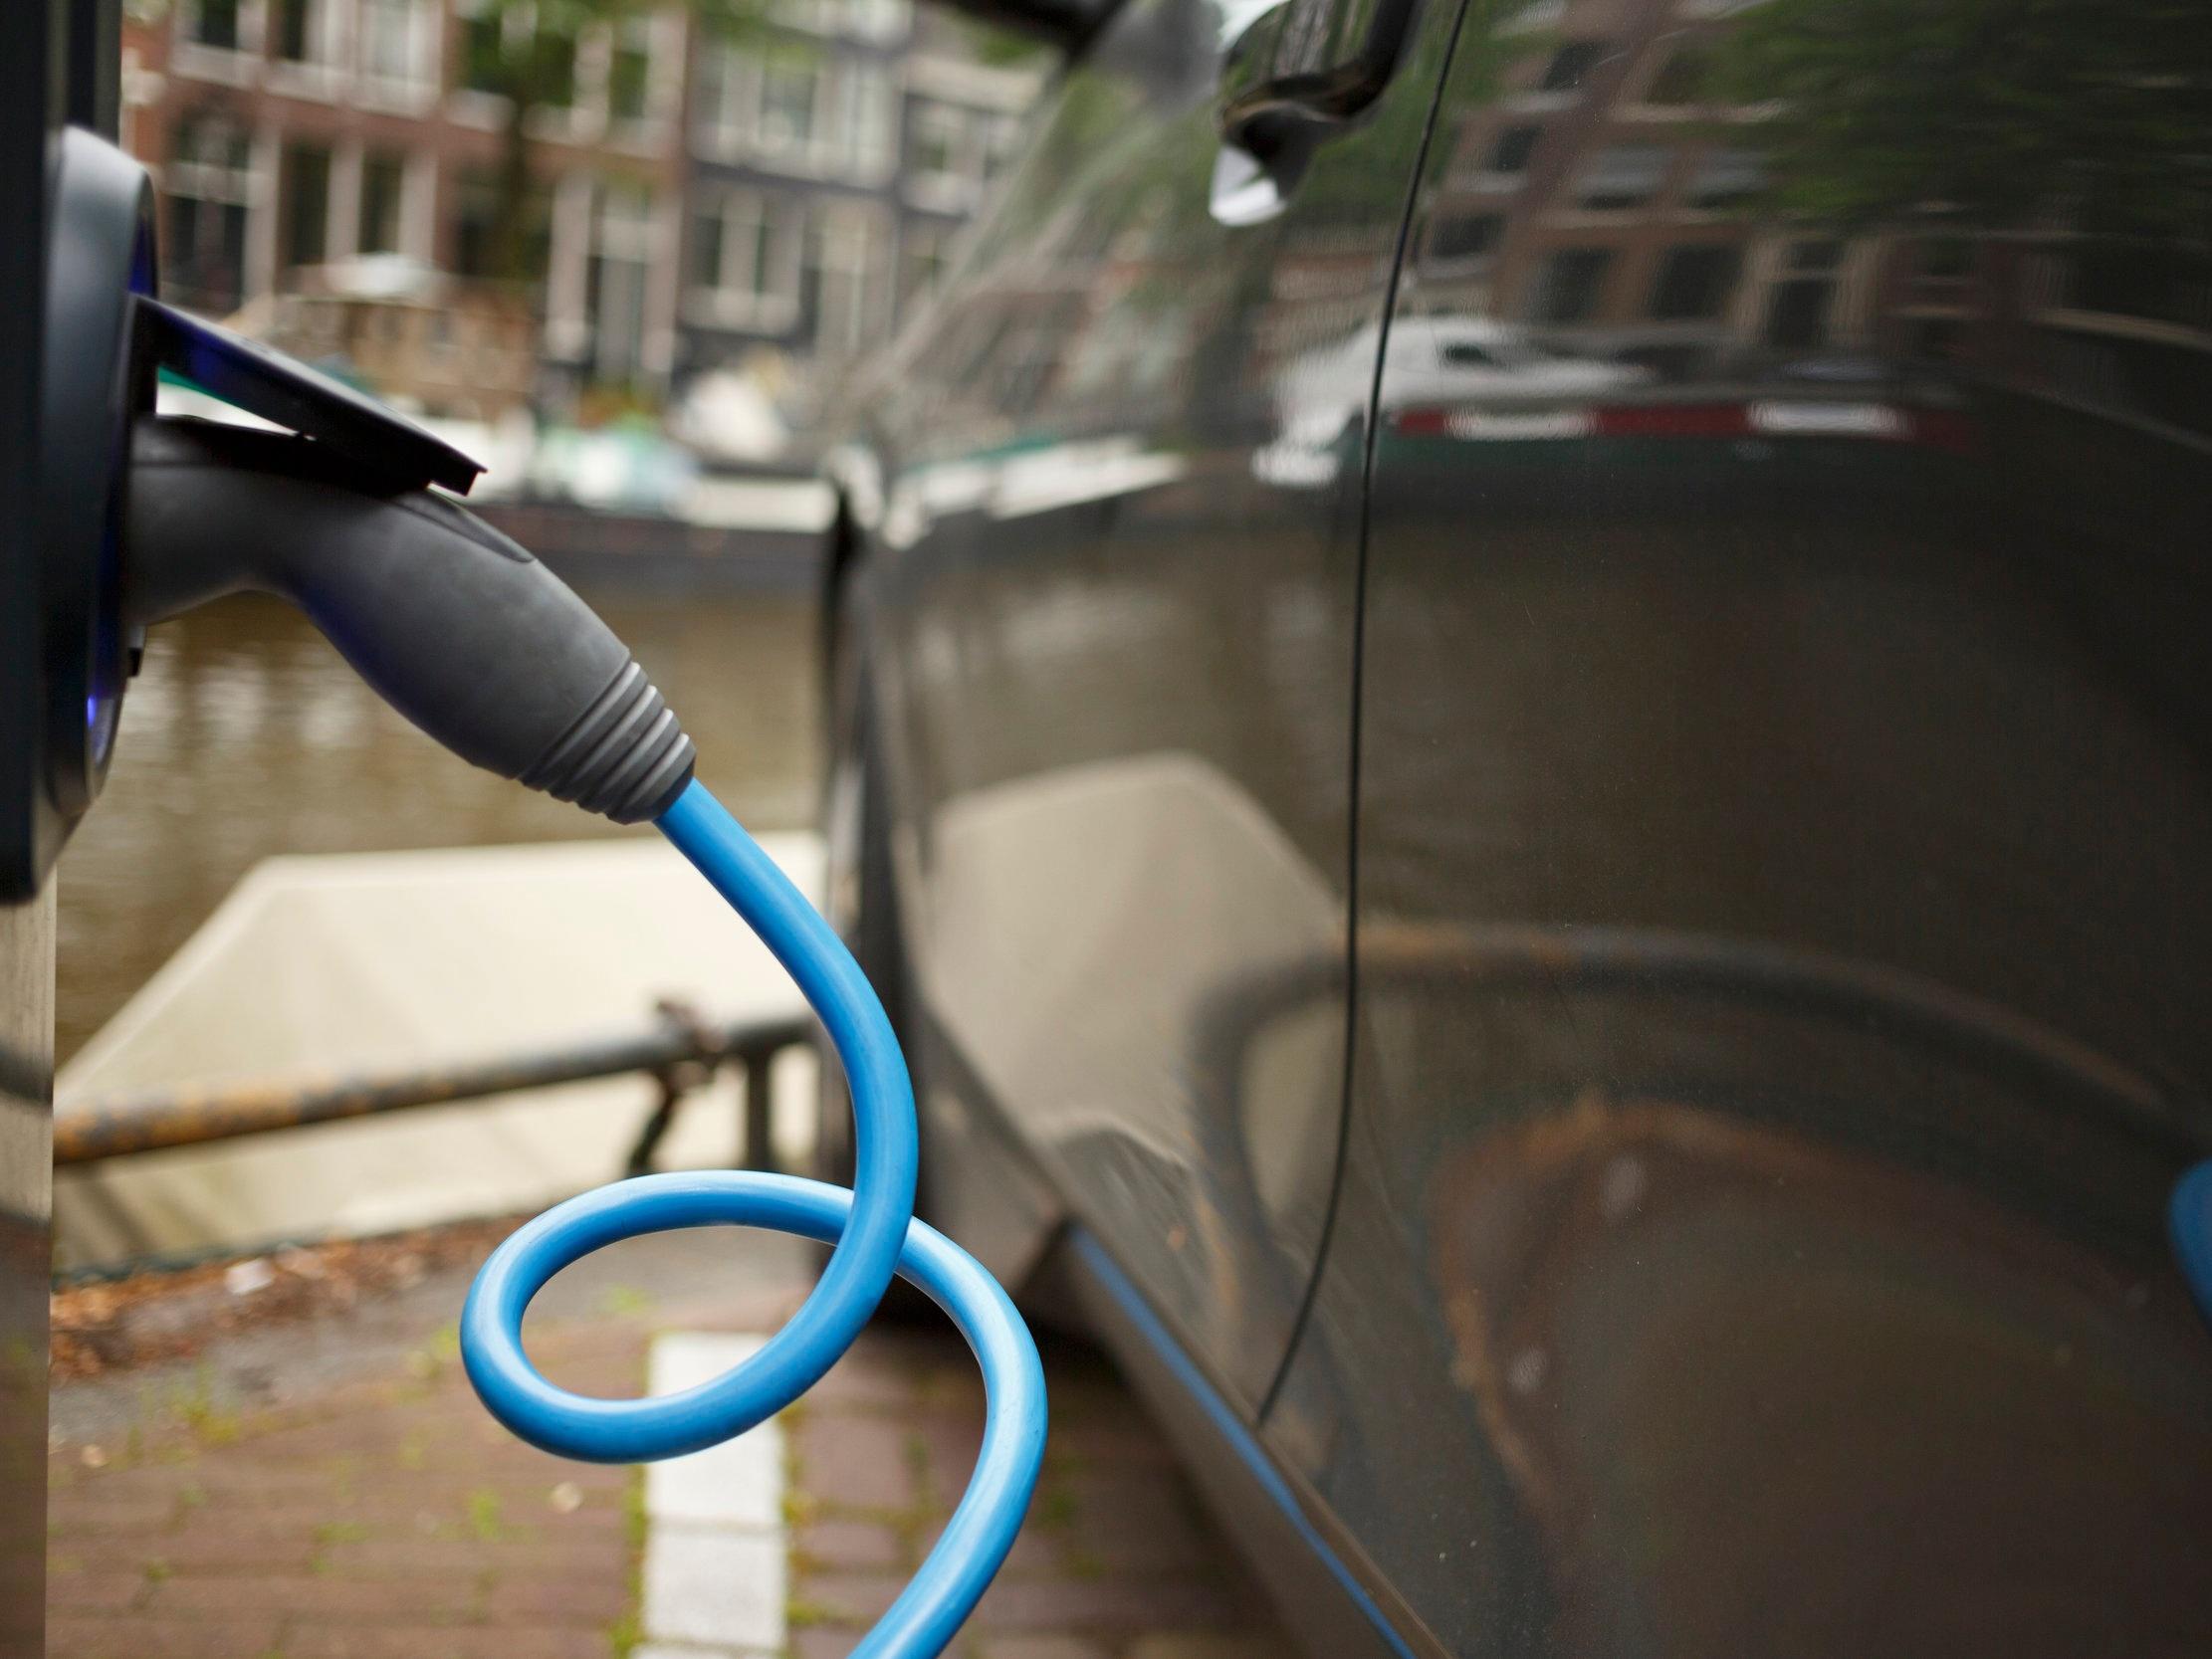 Solar charging vehicles